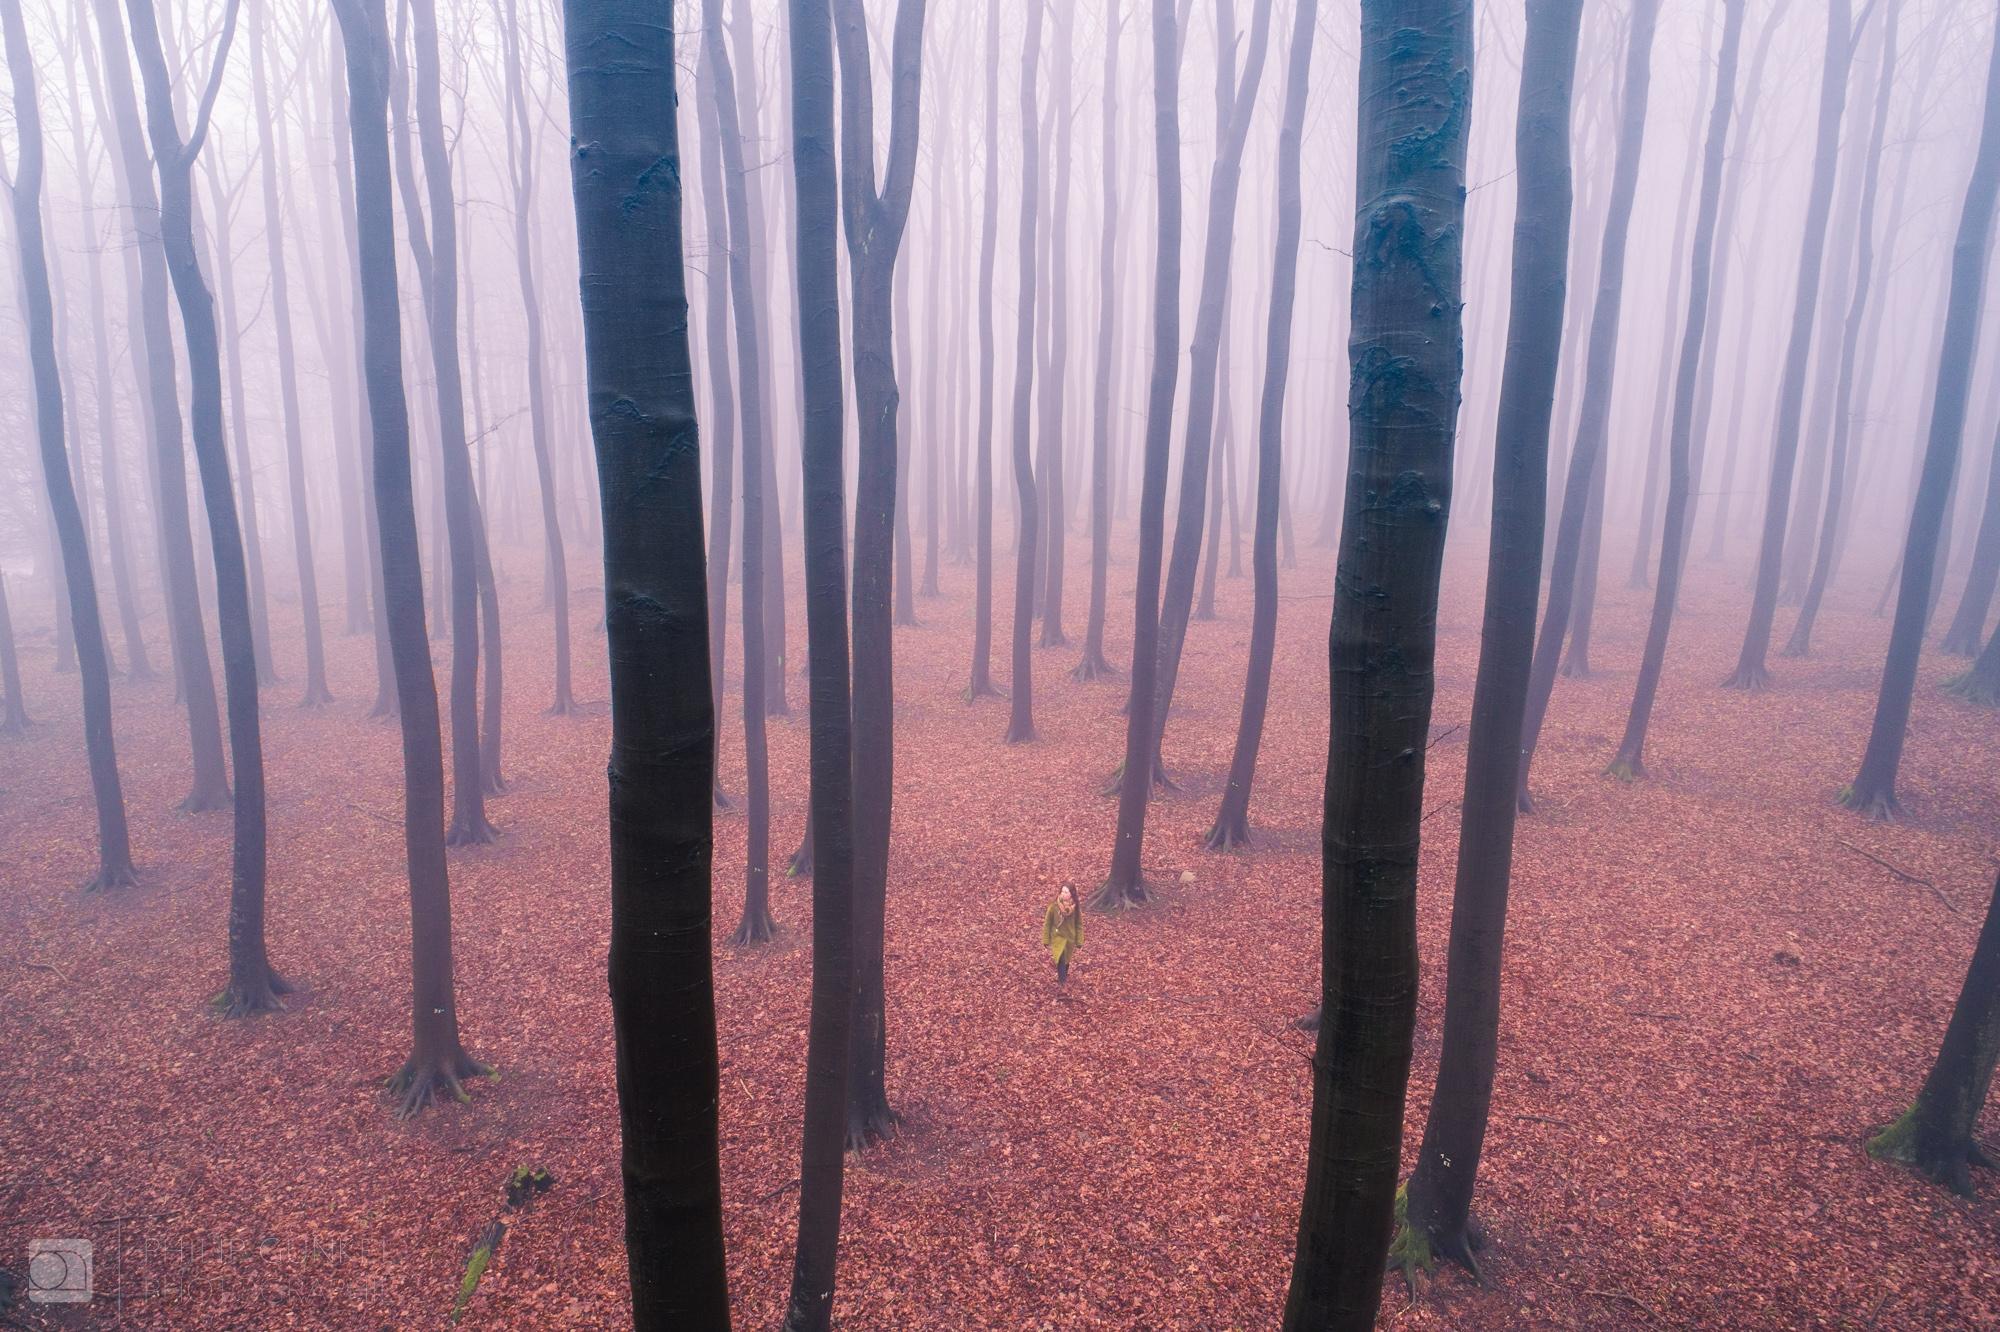 Exploring haunting forests Rüge - phigun | ello